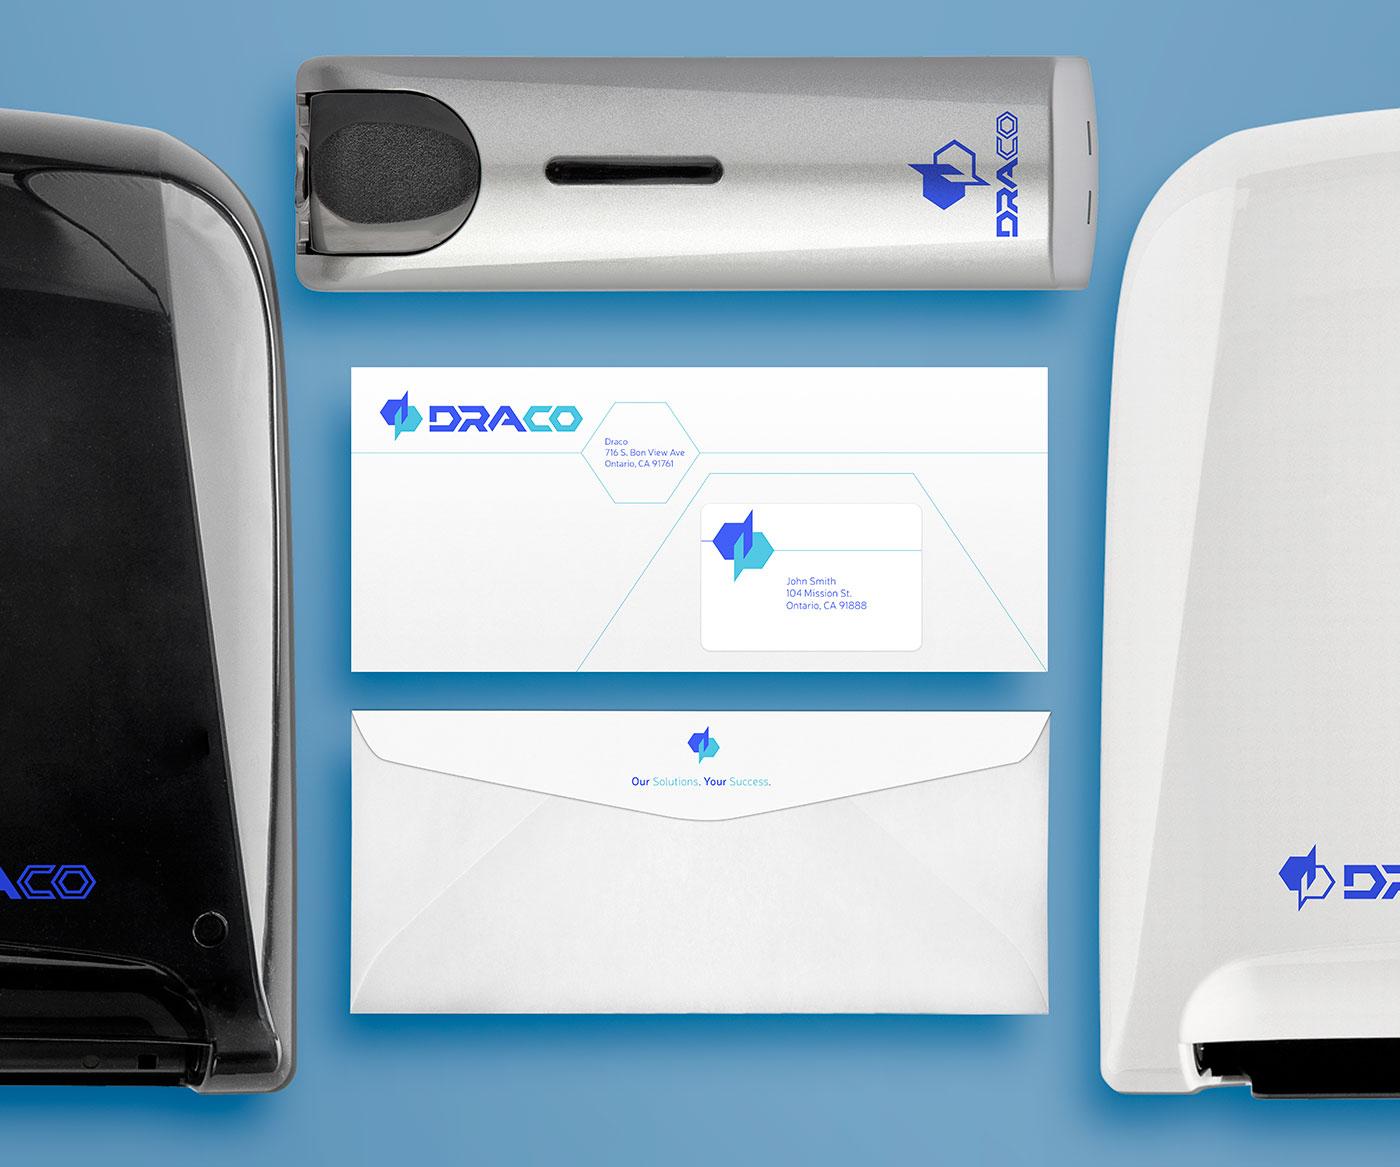 Outfit Branding & Design Draco Envelopes